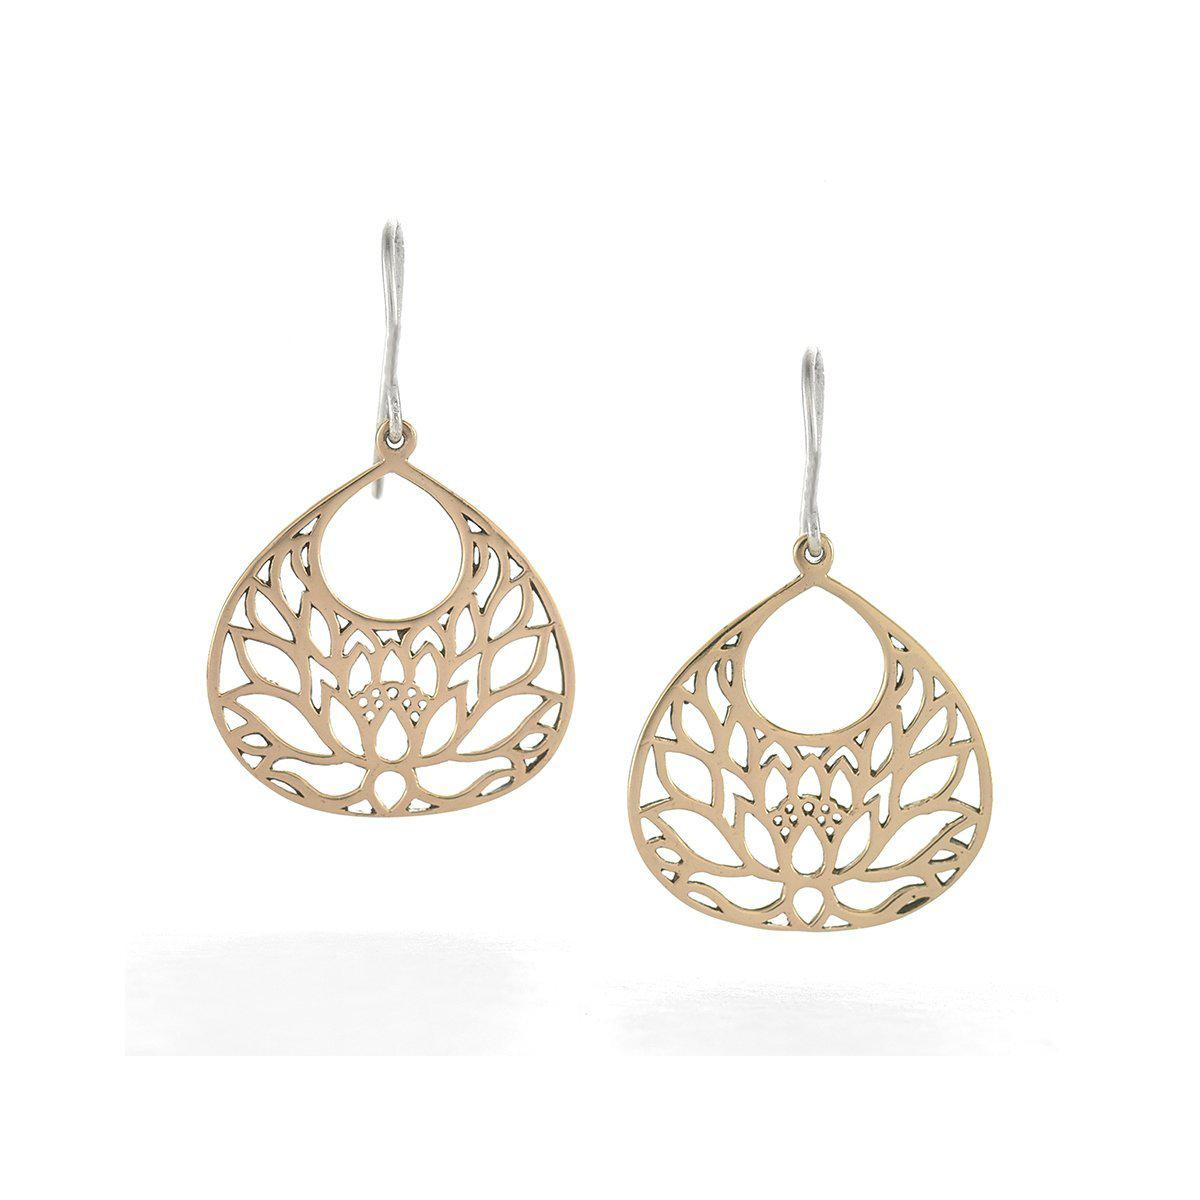 Lyst House Of Alaia Large Lotus Flower Earrings In Bronze In